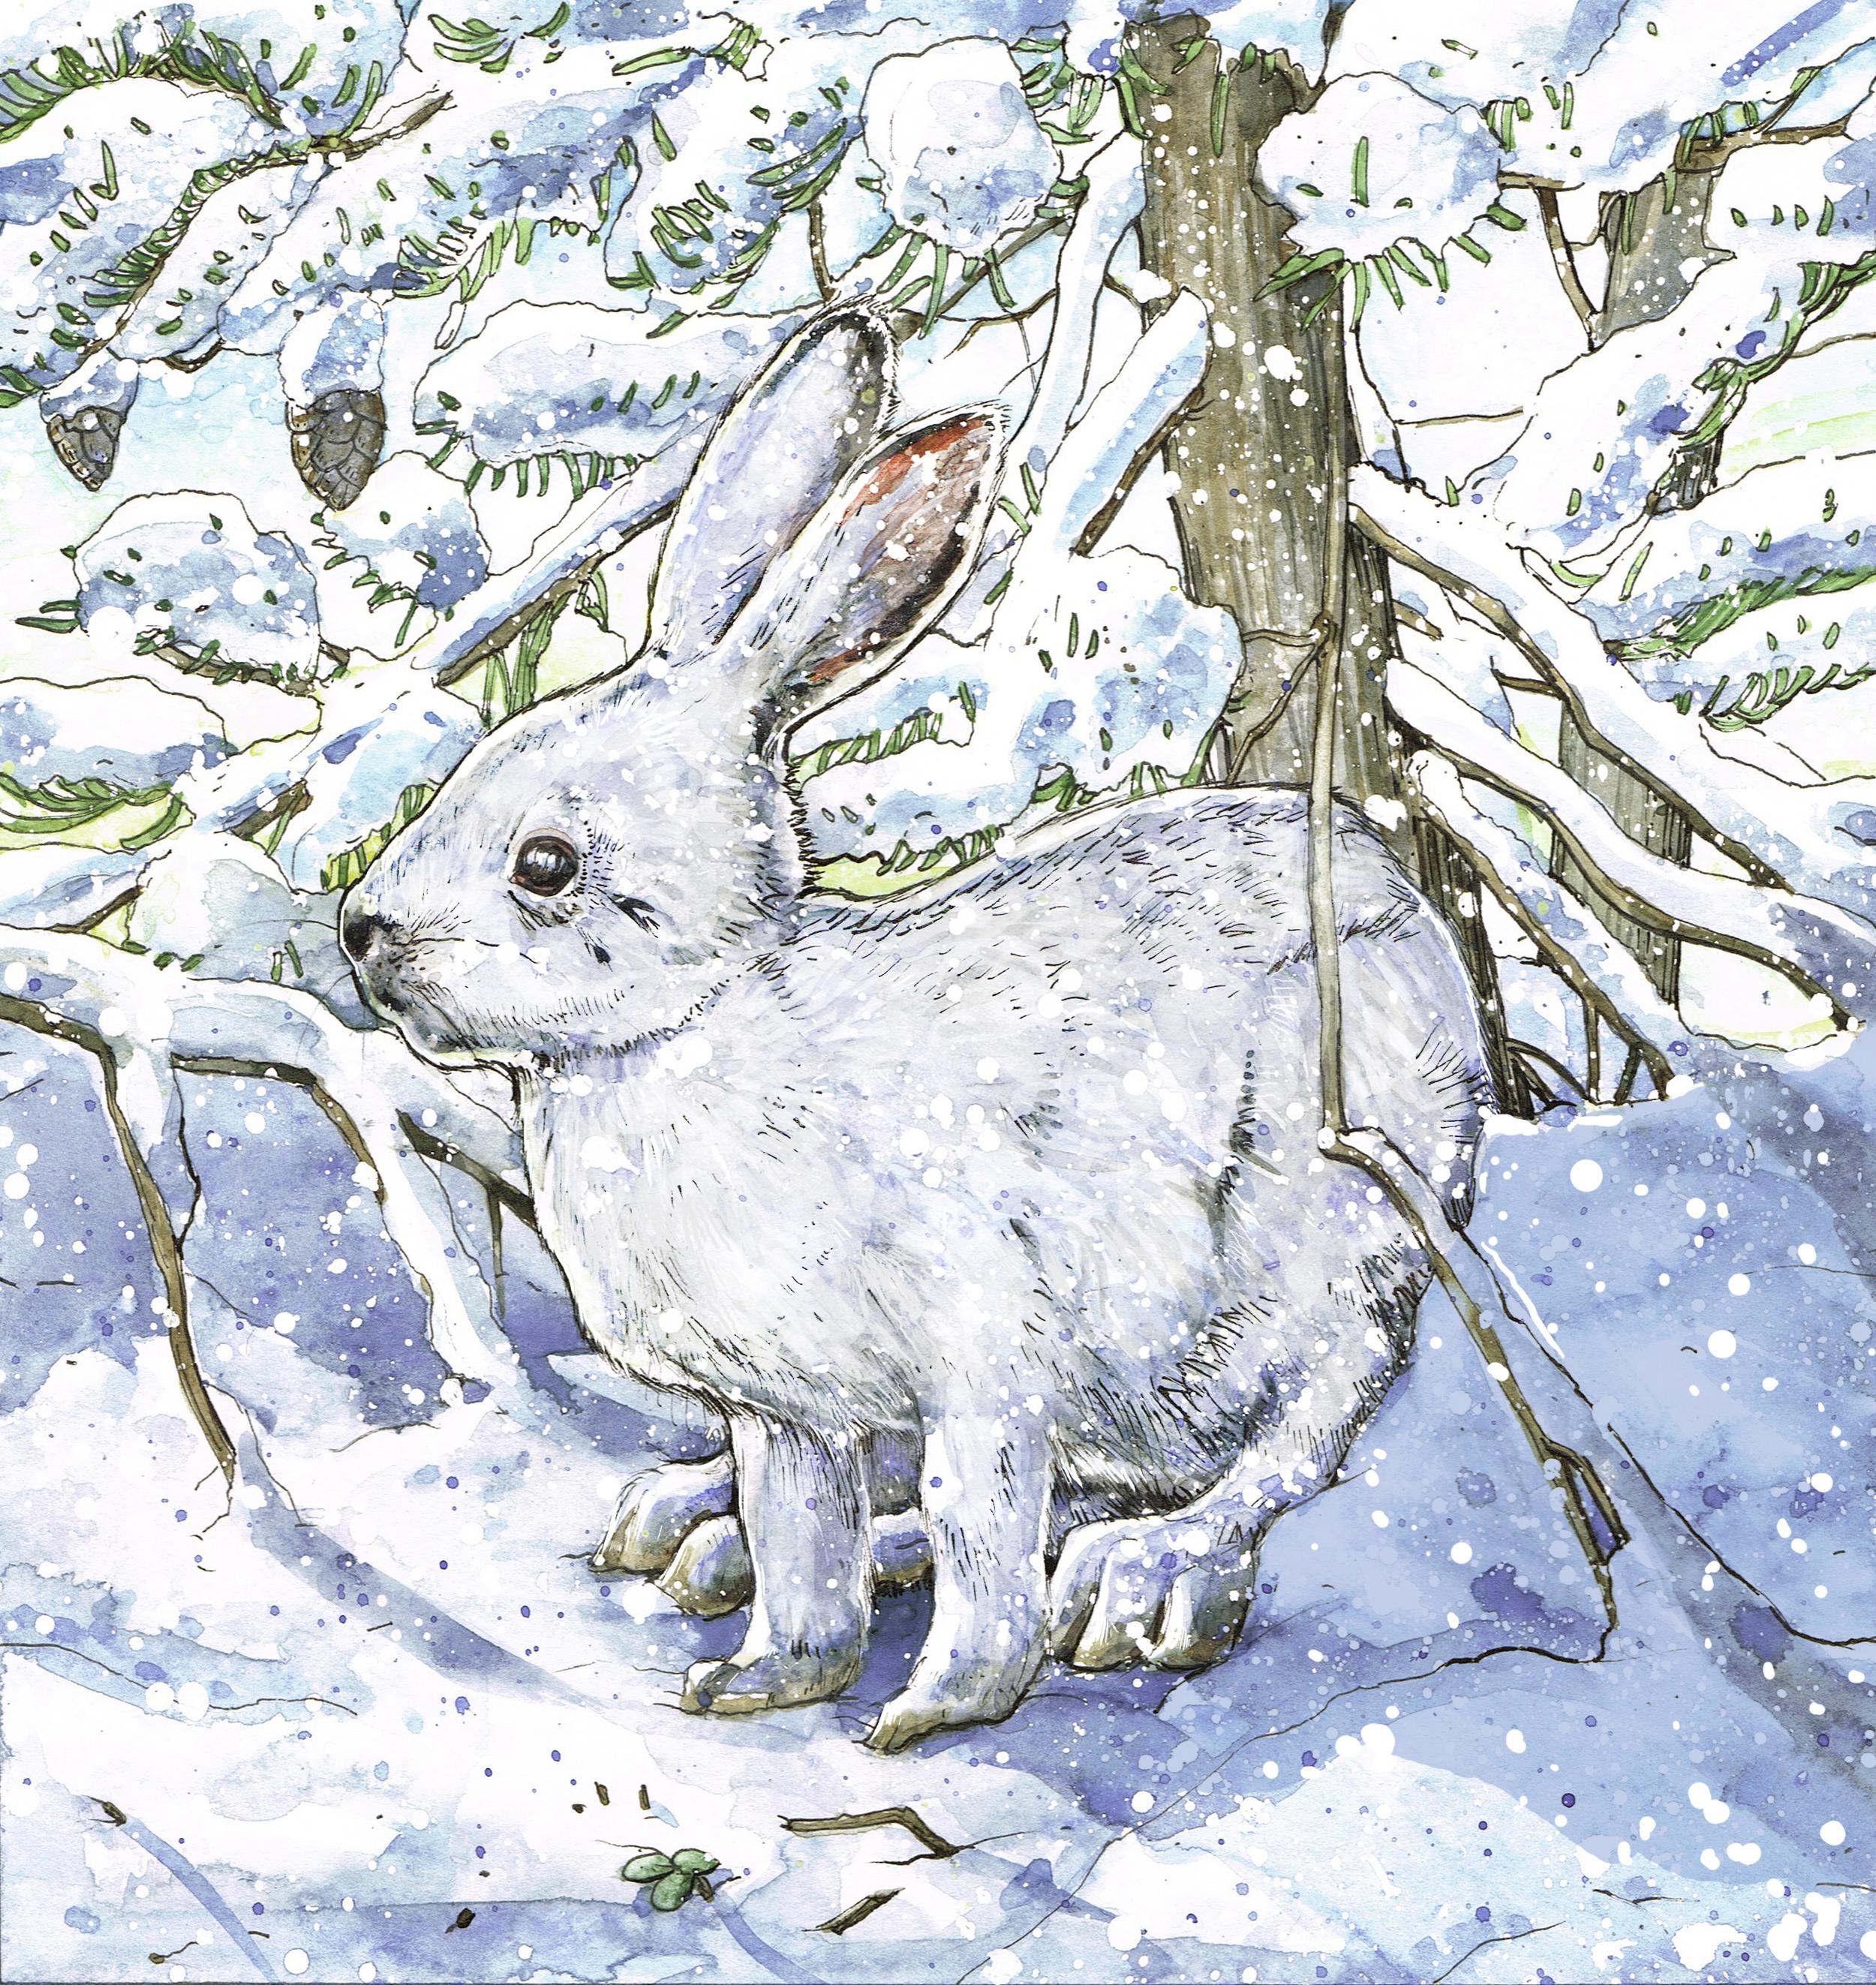 Hare_Winter.jpg